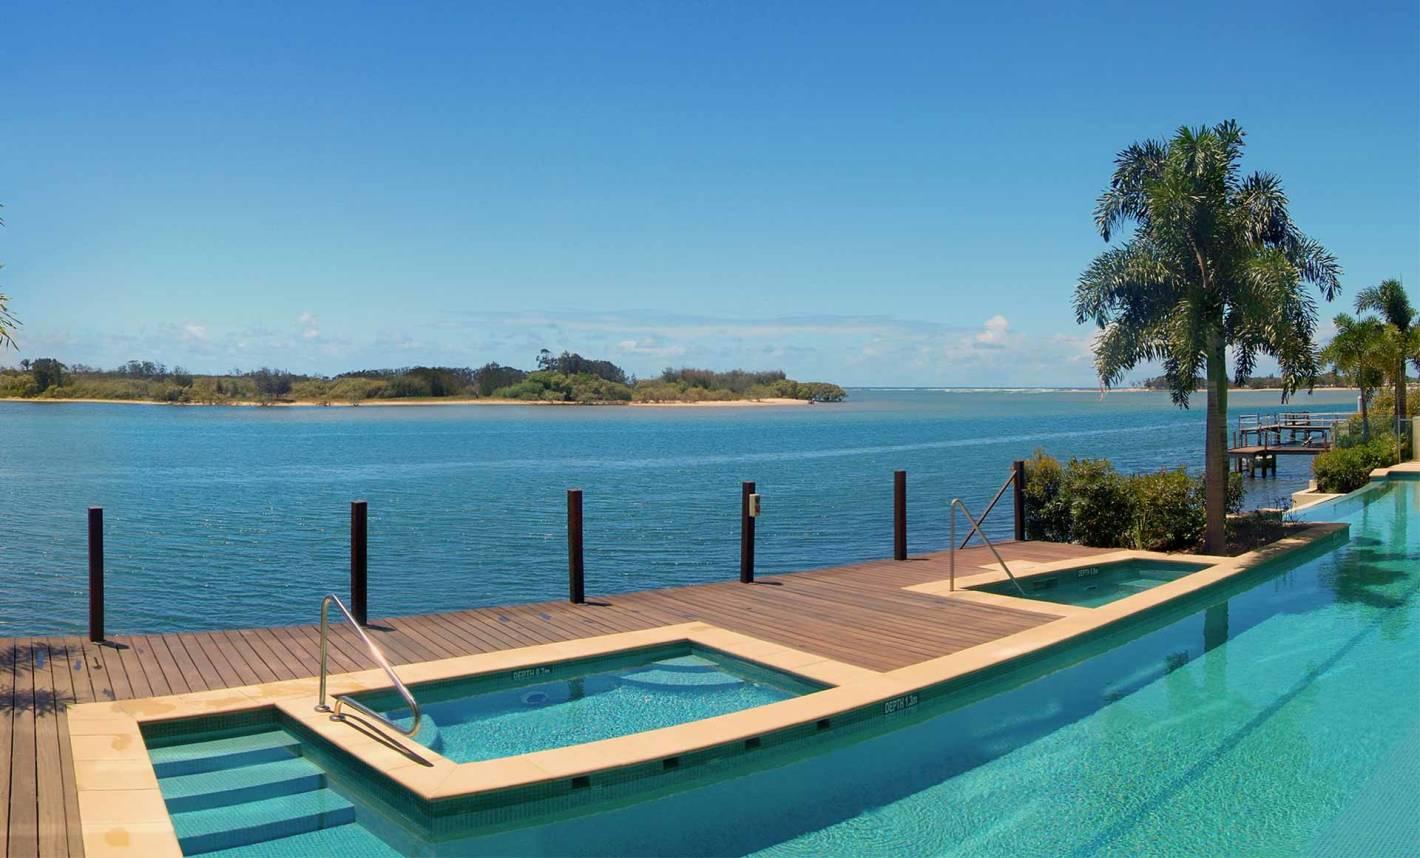 Sunshine Coast pools with epic views